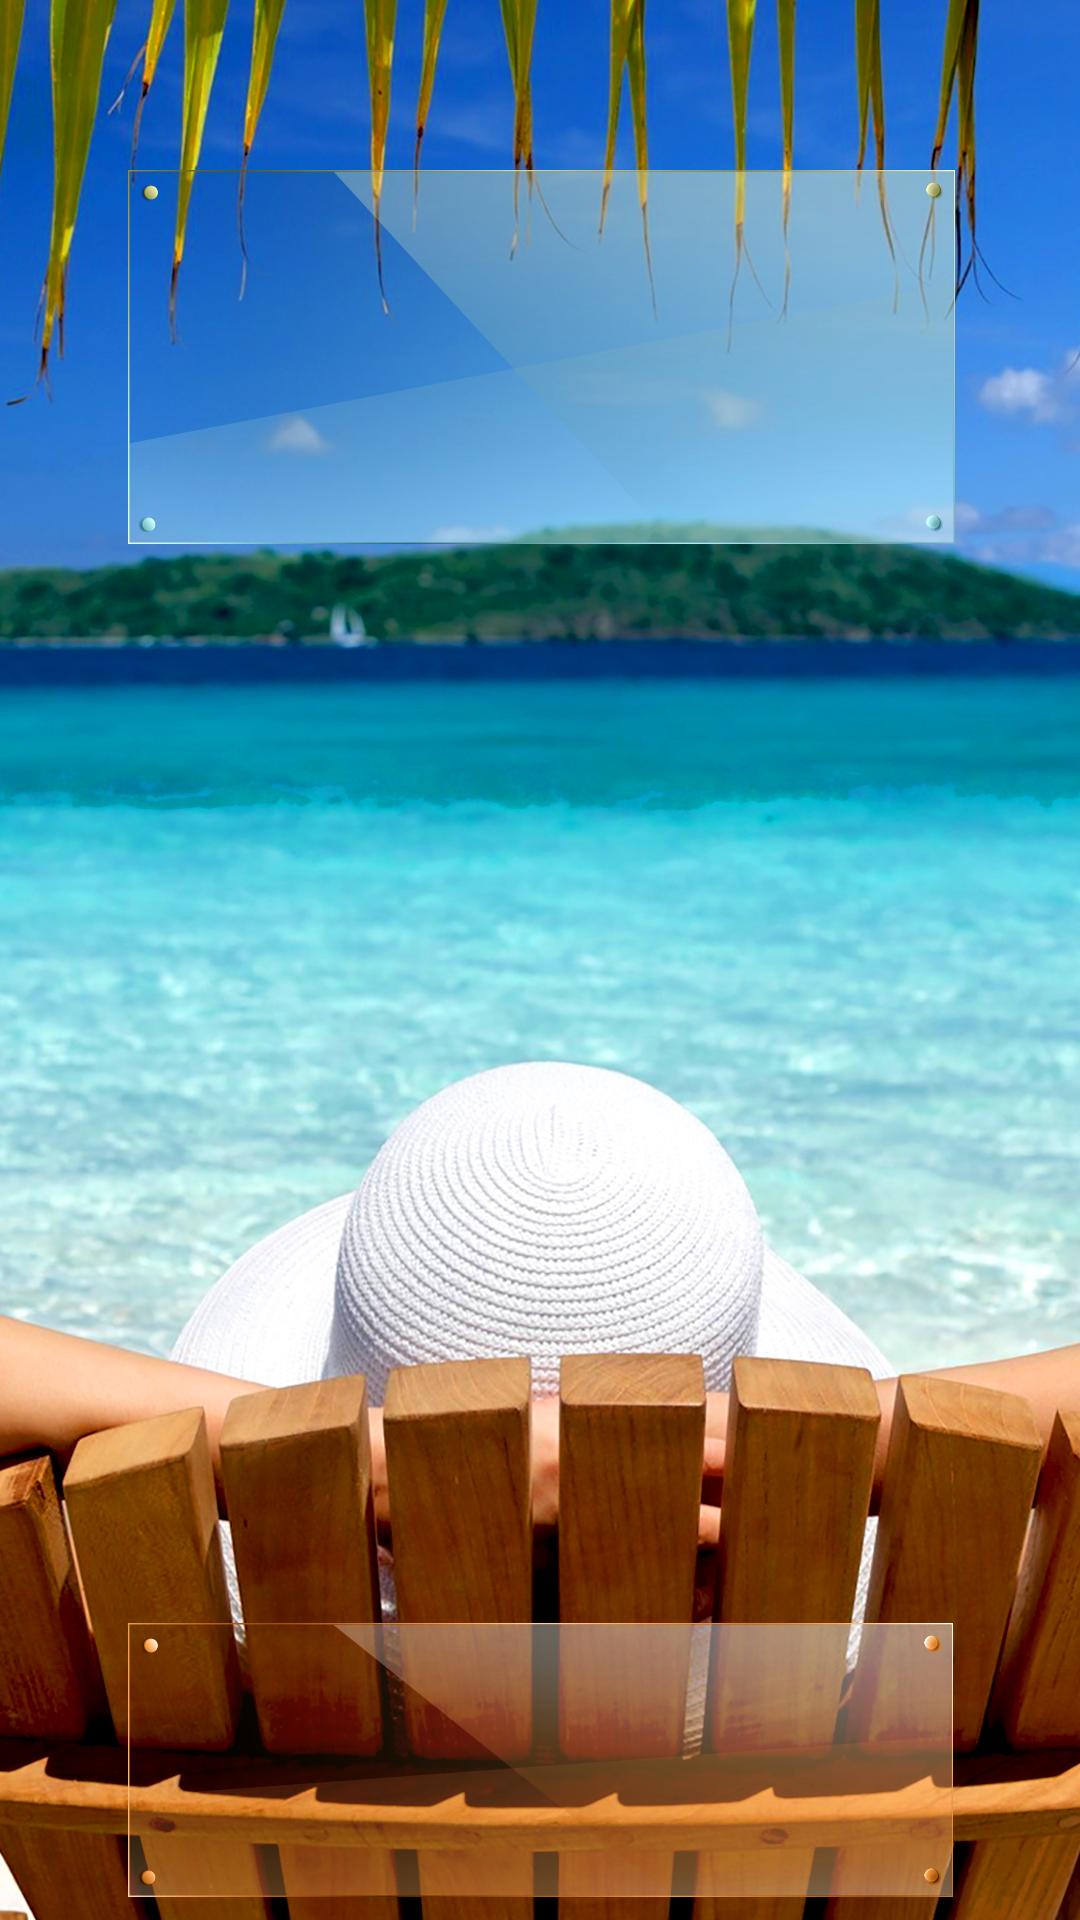 Tap And Get The Free App Lockscreens Art Creative Sky Water Sun Beach Chill Hat Blue White Palms Hd Iphone 6 Plus Lo Rain Wallpapers Hello Summer Lockscreen